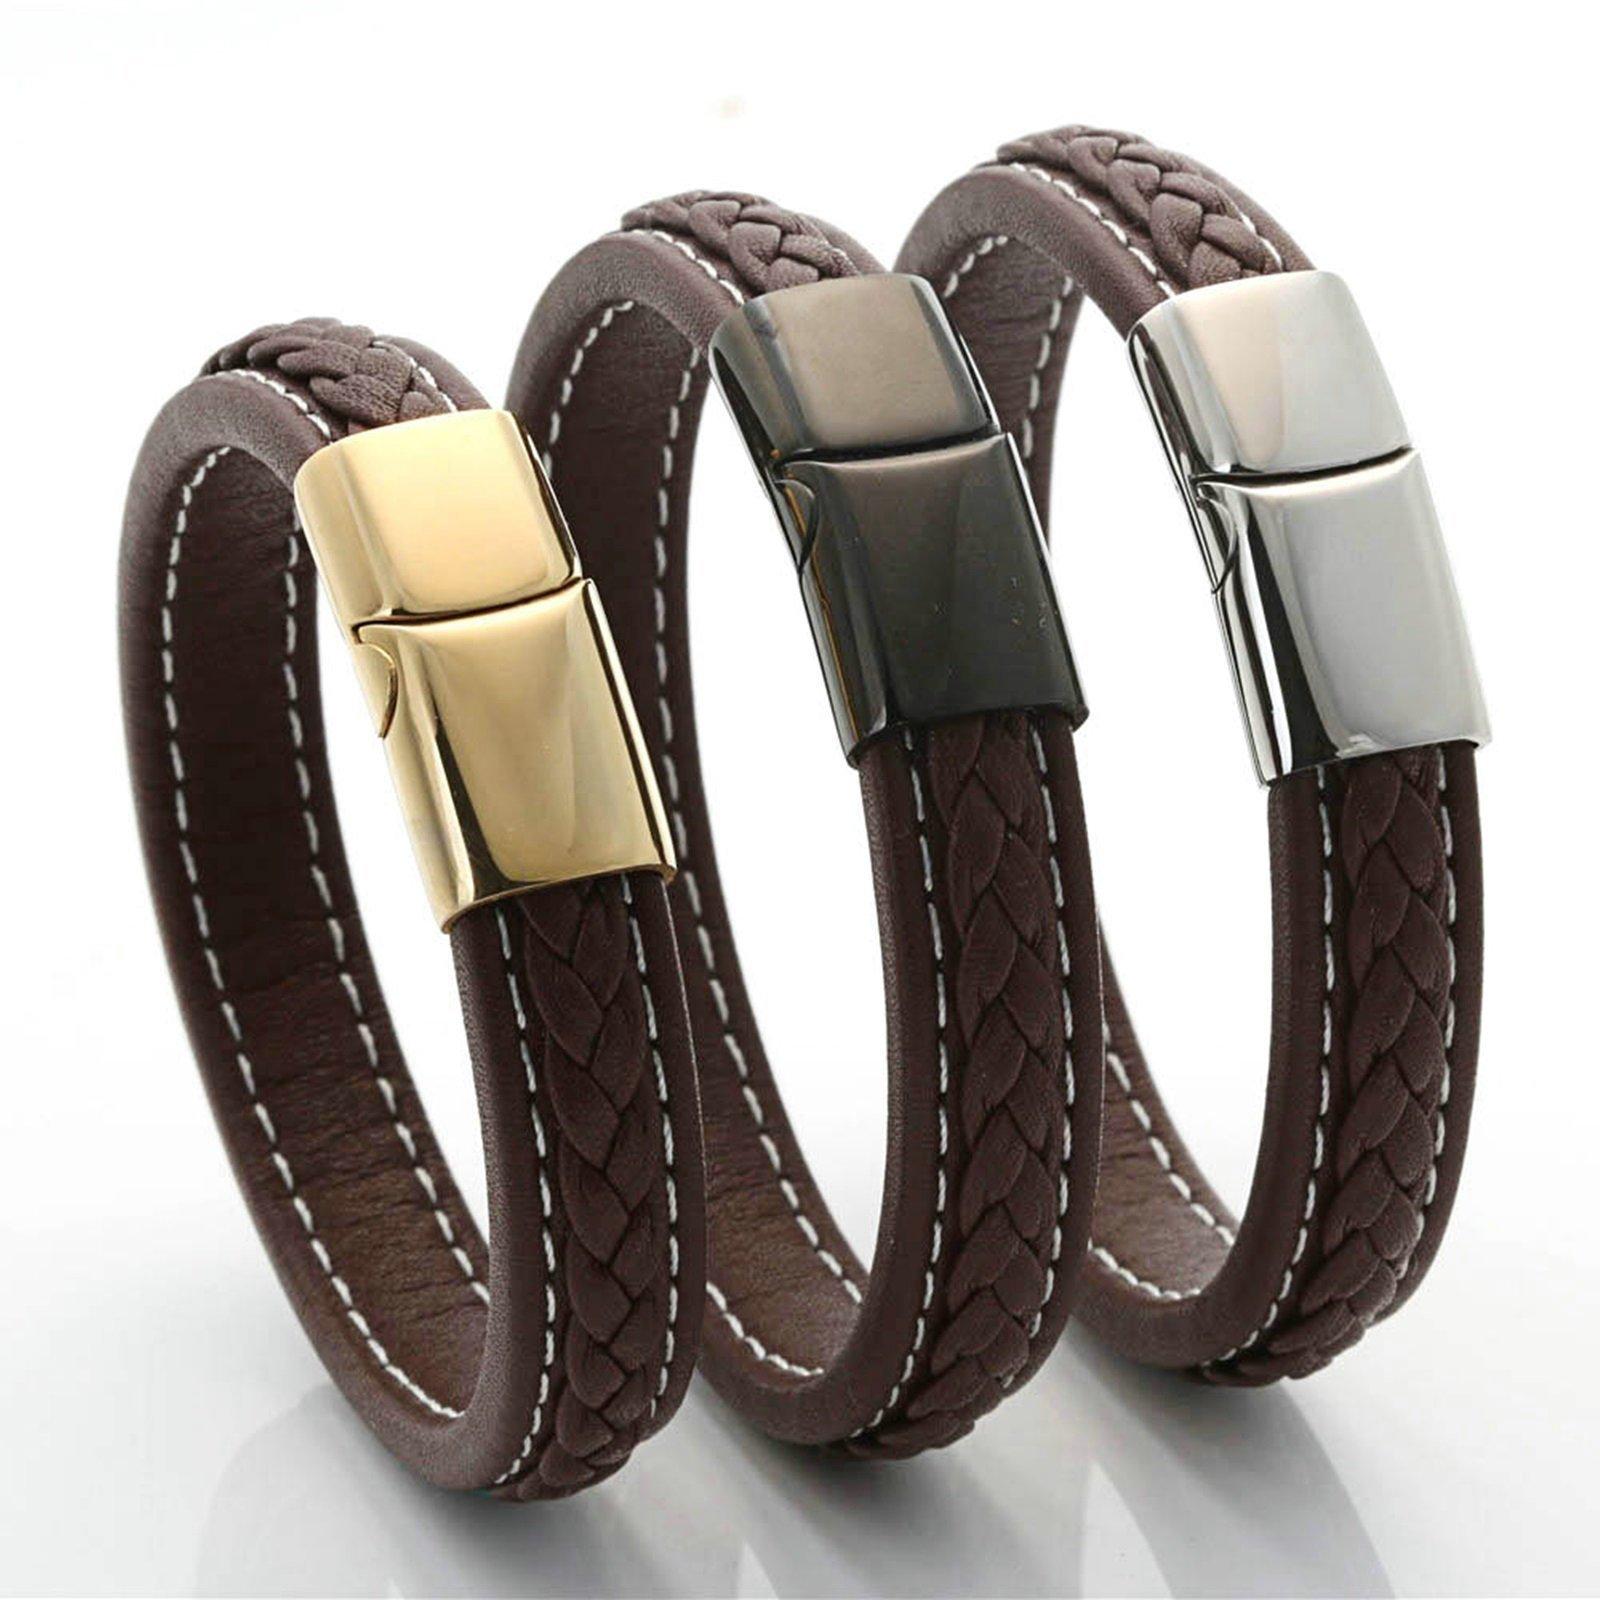 Aooaz Jewelry Titanium Steel Bracelet for Men Woven Rope Cuff Bracelet Black 20.5CM Chain Bracelet